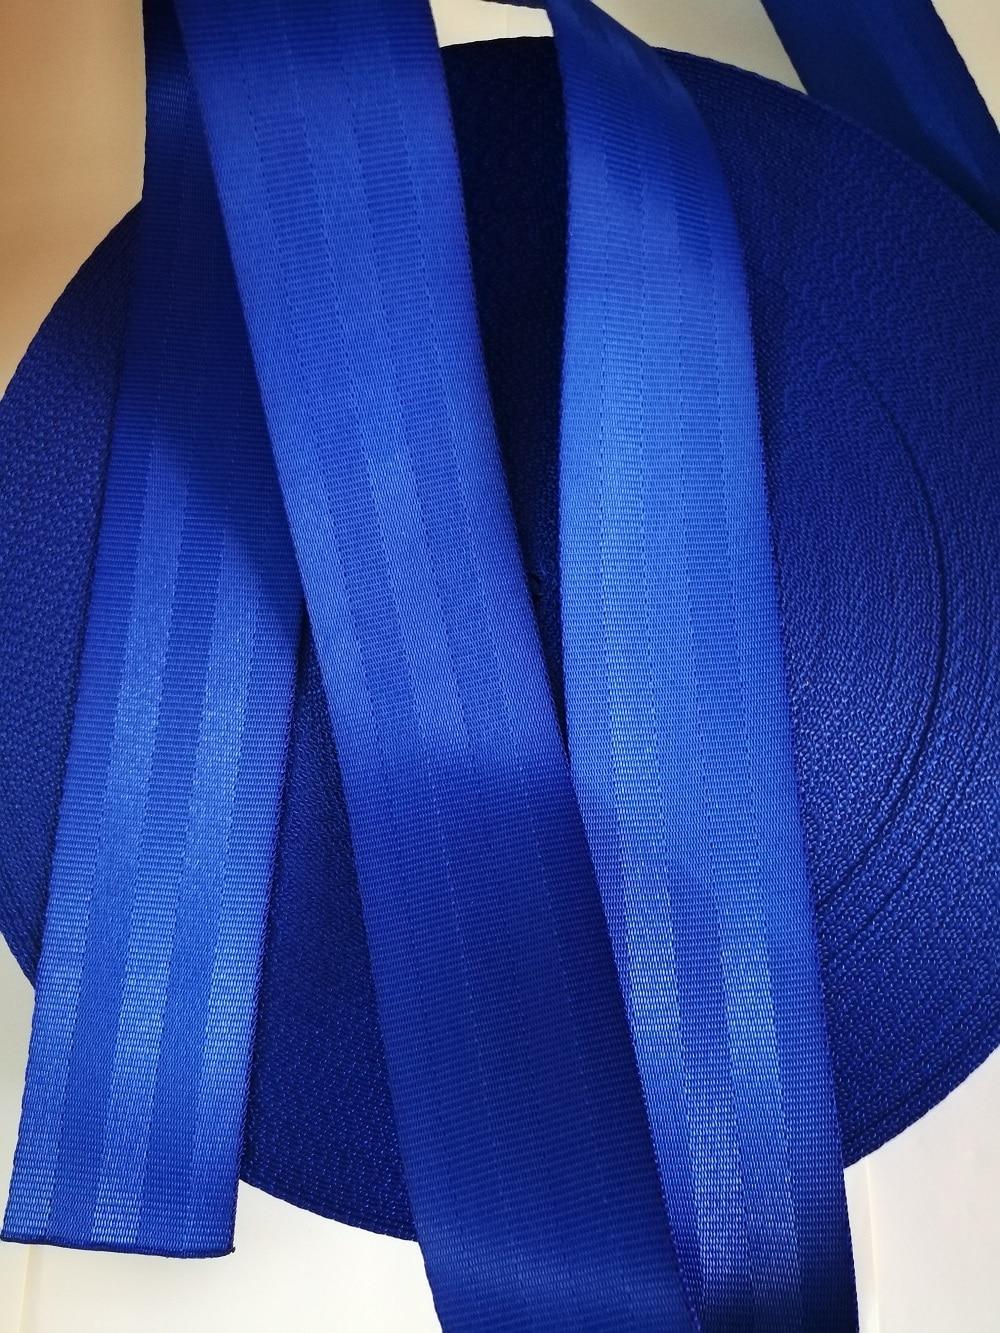 Blue 3M-30M car modified seat belt webbing 3C standard certified child safety belt car accessories